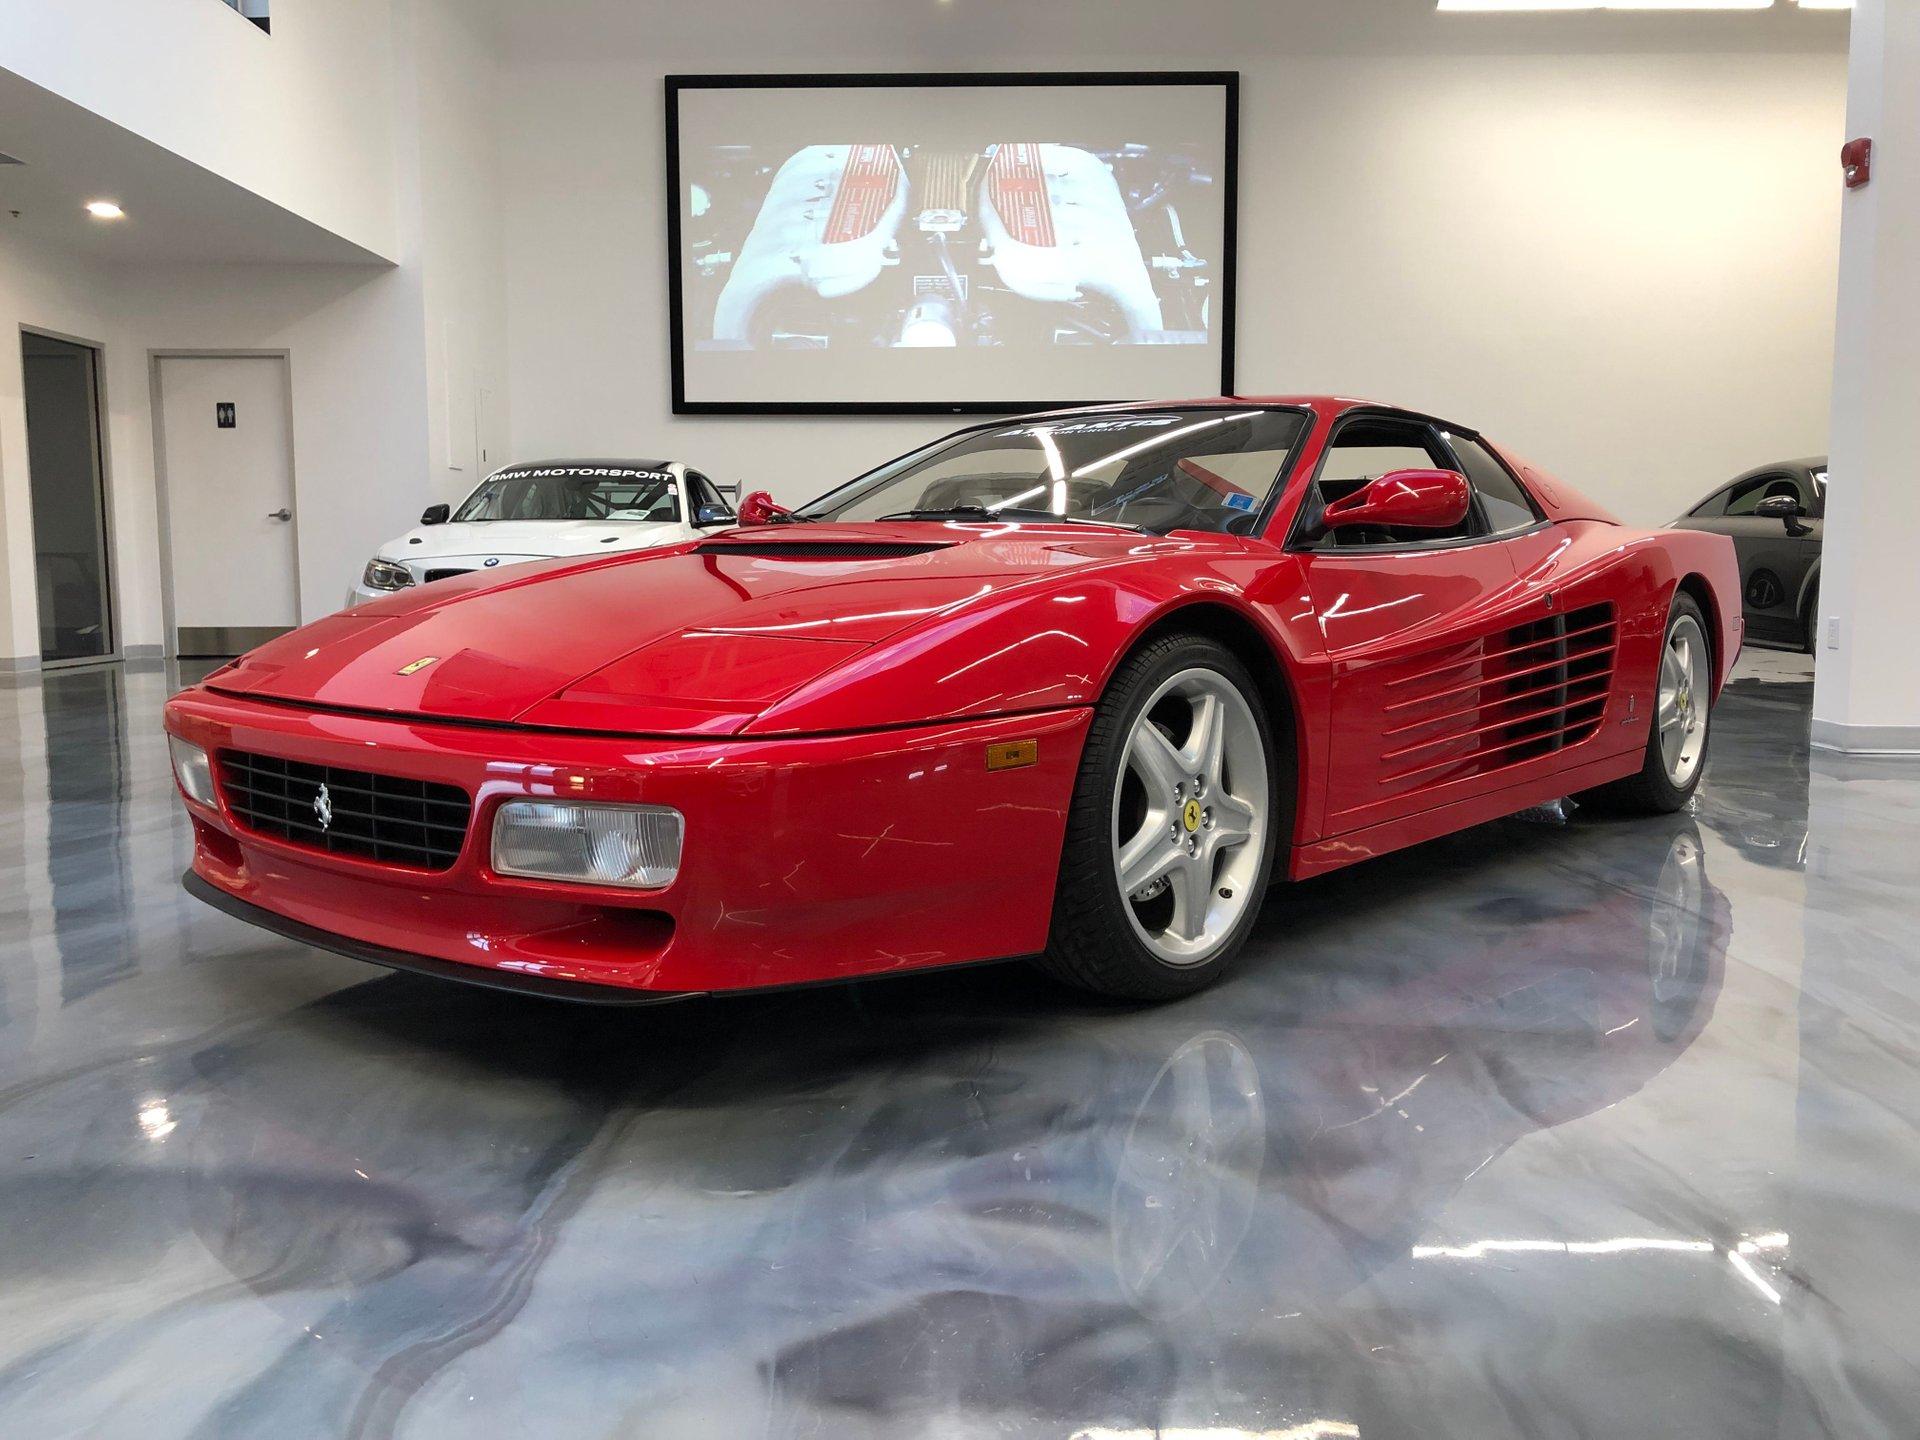 1994 ferrari 512 tr sold thank you